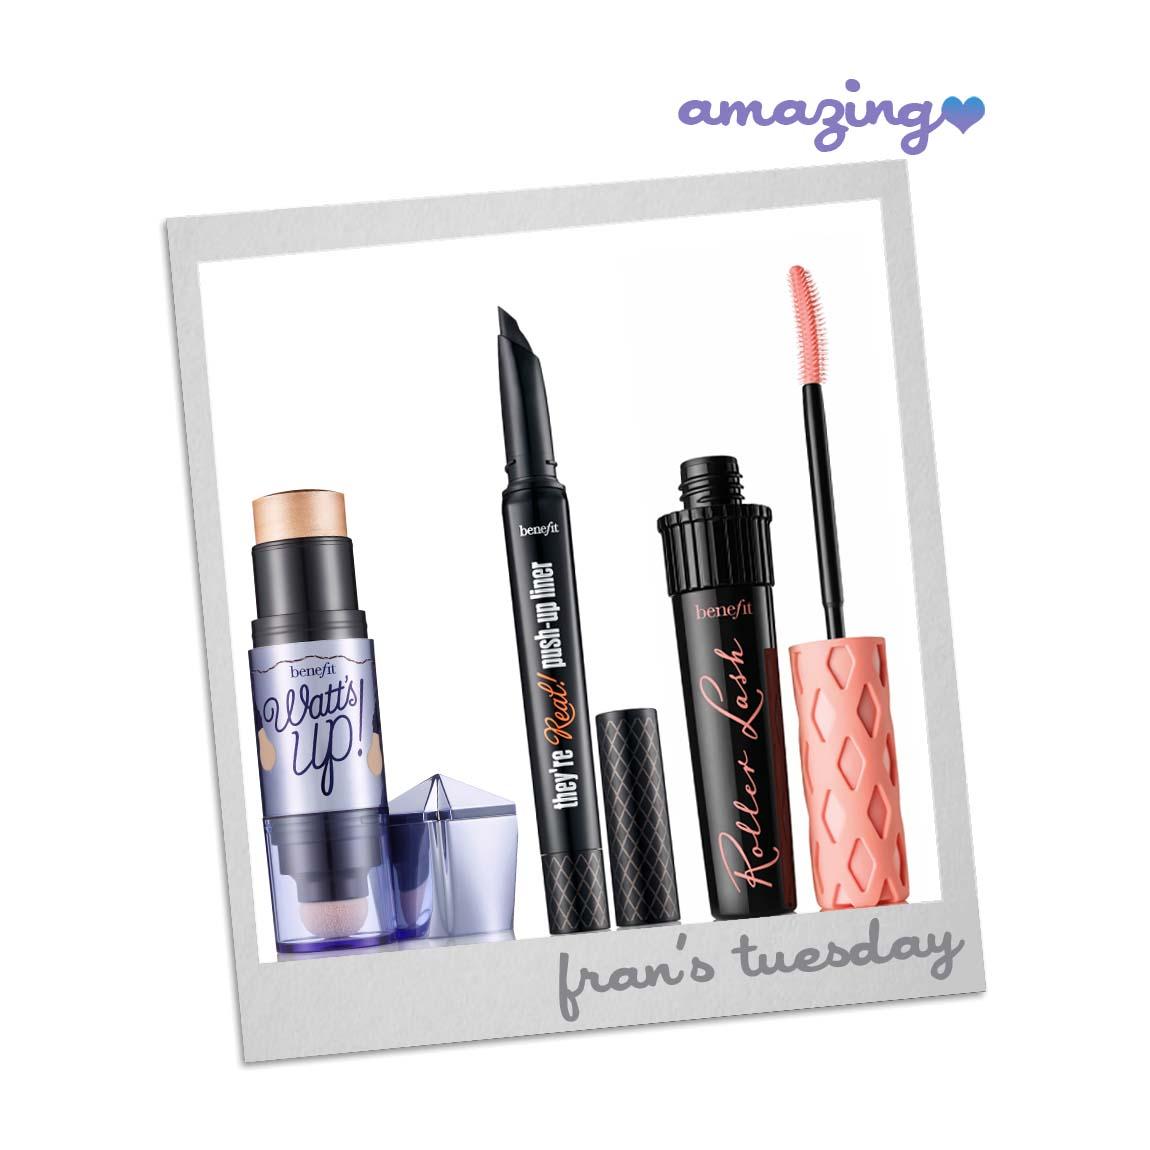 b55b5cebd72 Benefit Cosmetics – Roller Lash Mascara, Watts Up! Highlighter & They're  Real! Push-Up Liner — Amazing PR